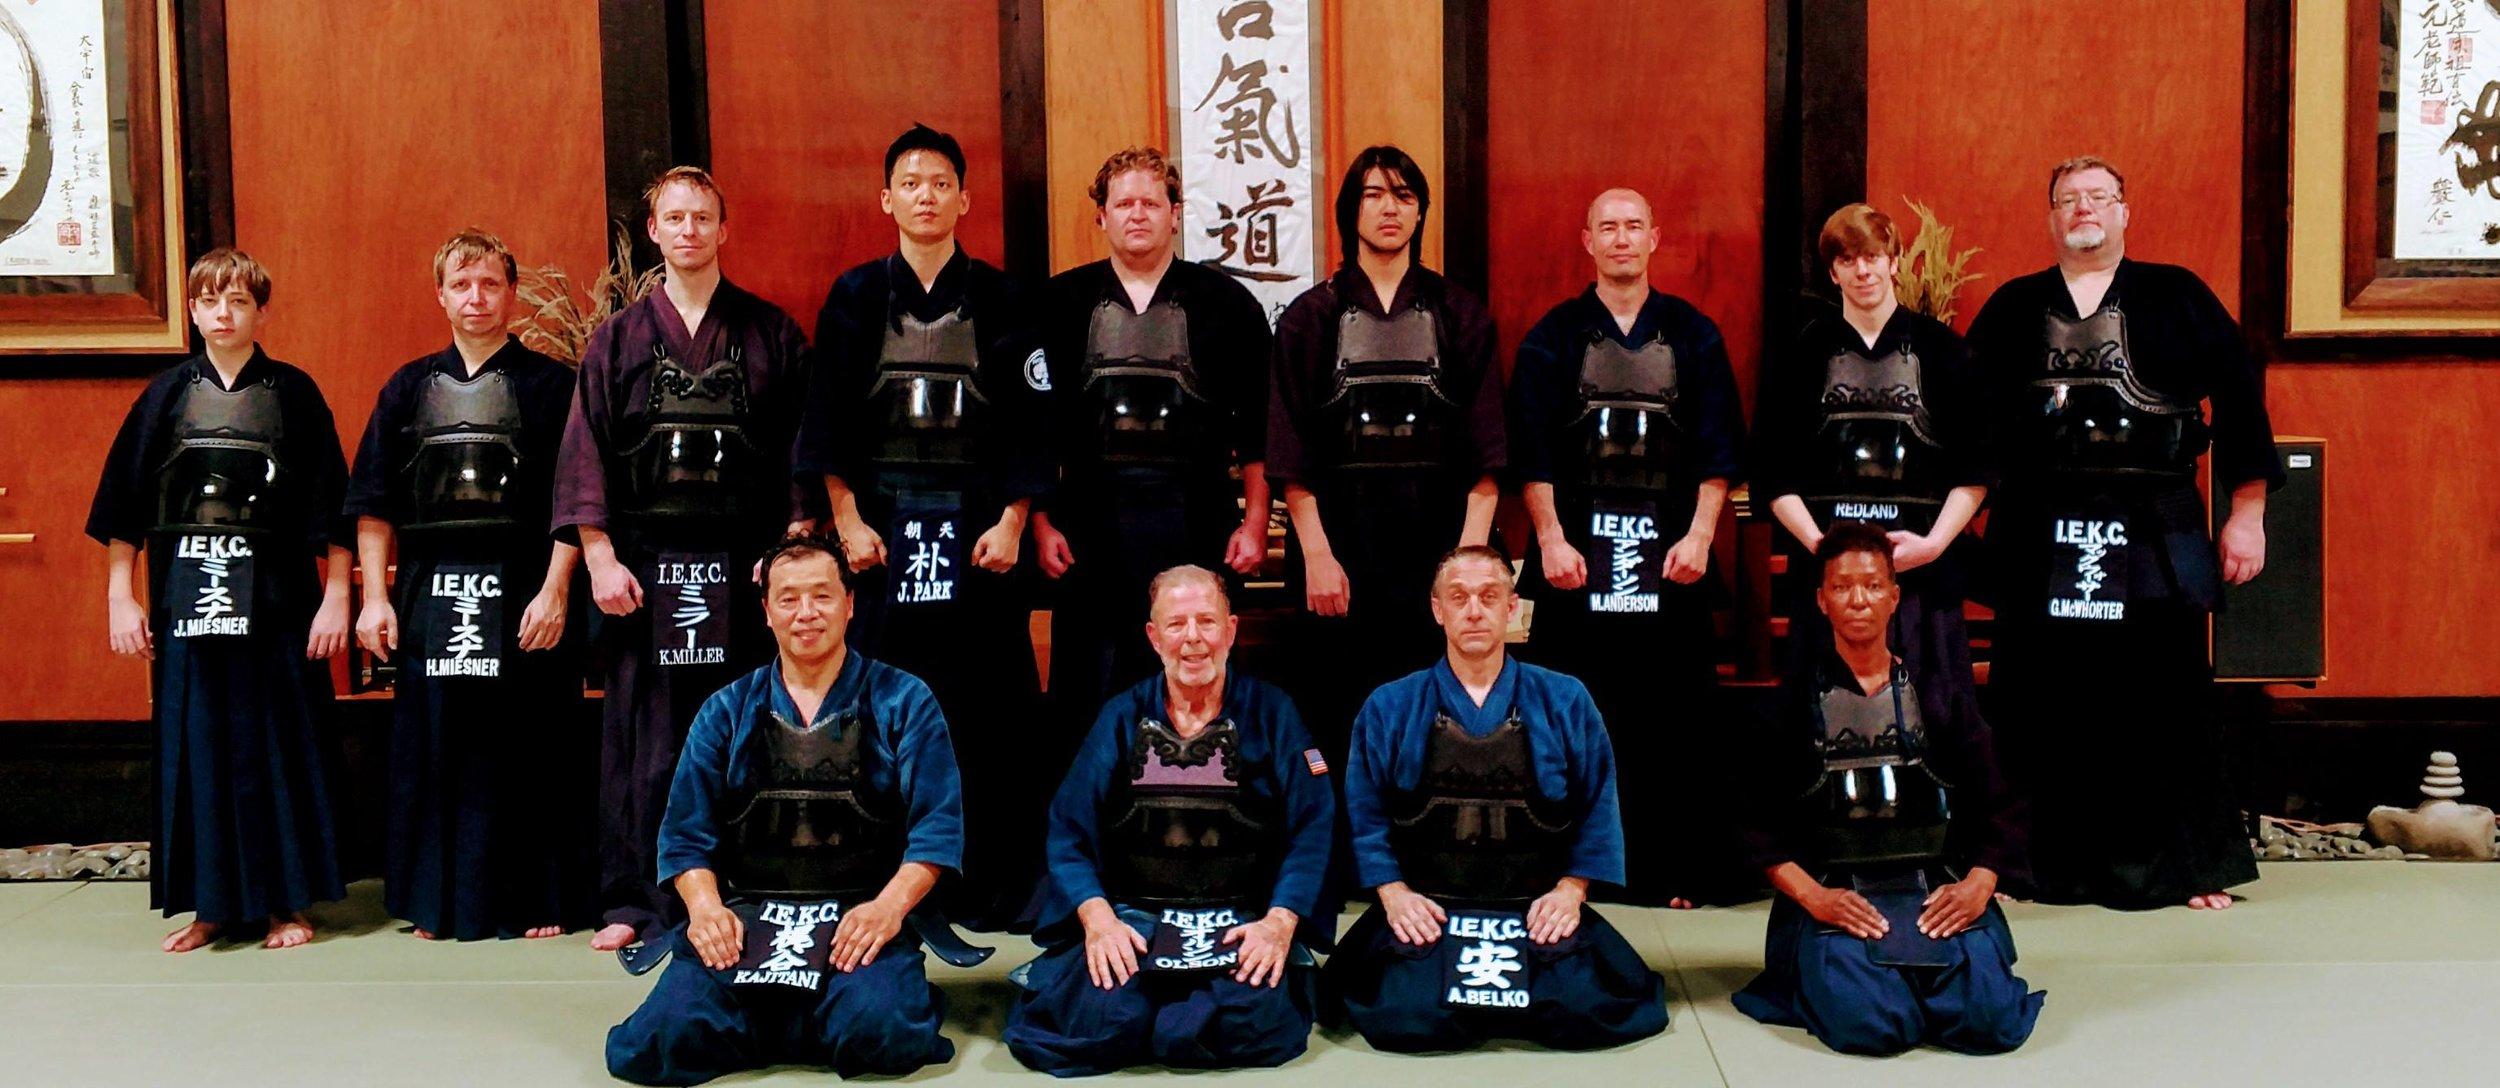 kendo group pic.jpg